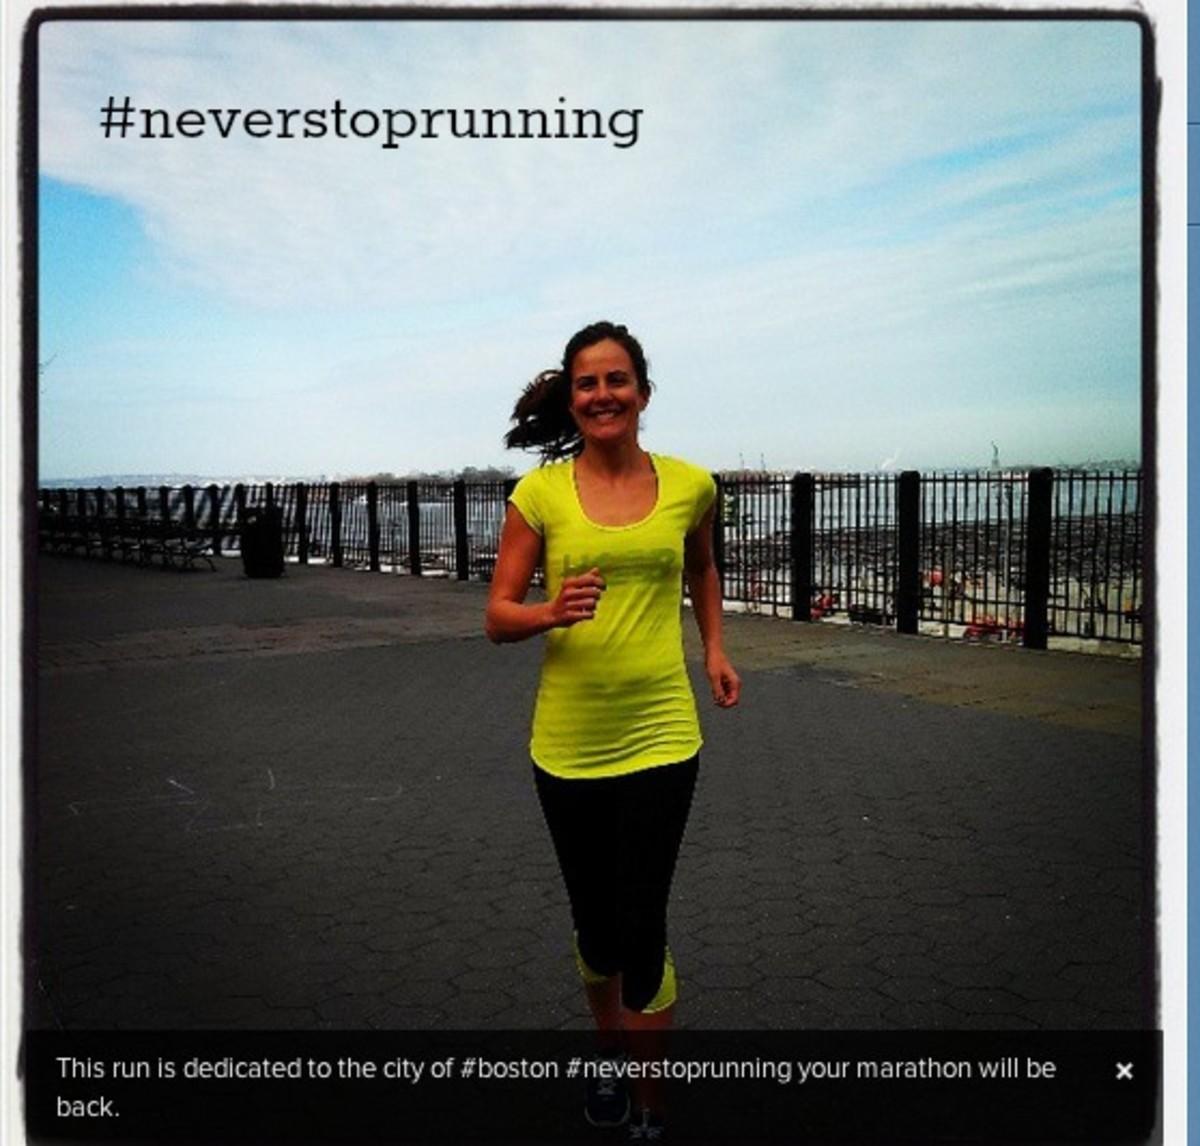 #neverstoprunning